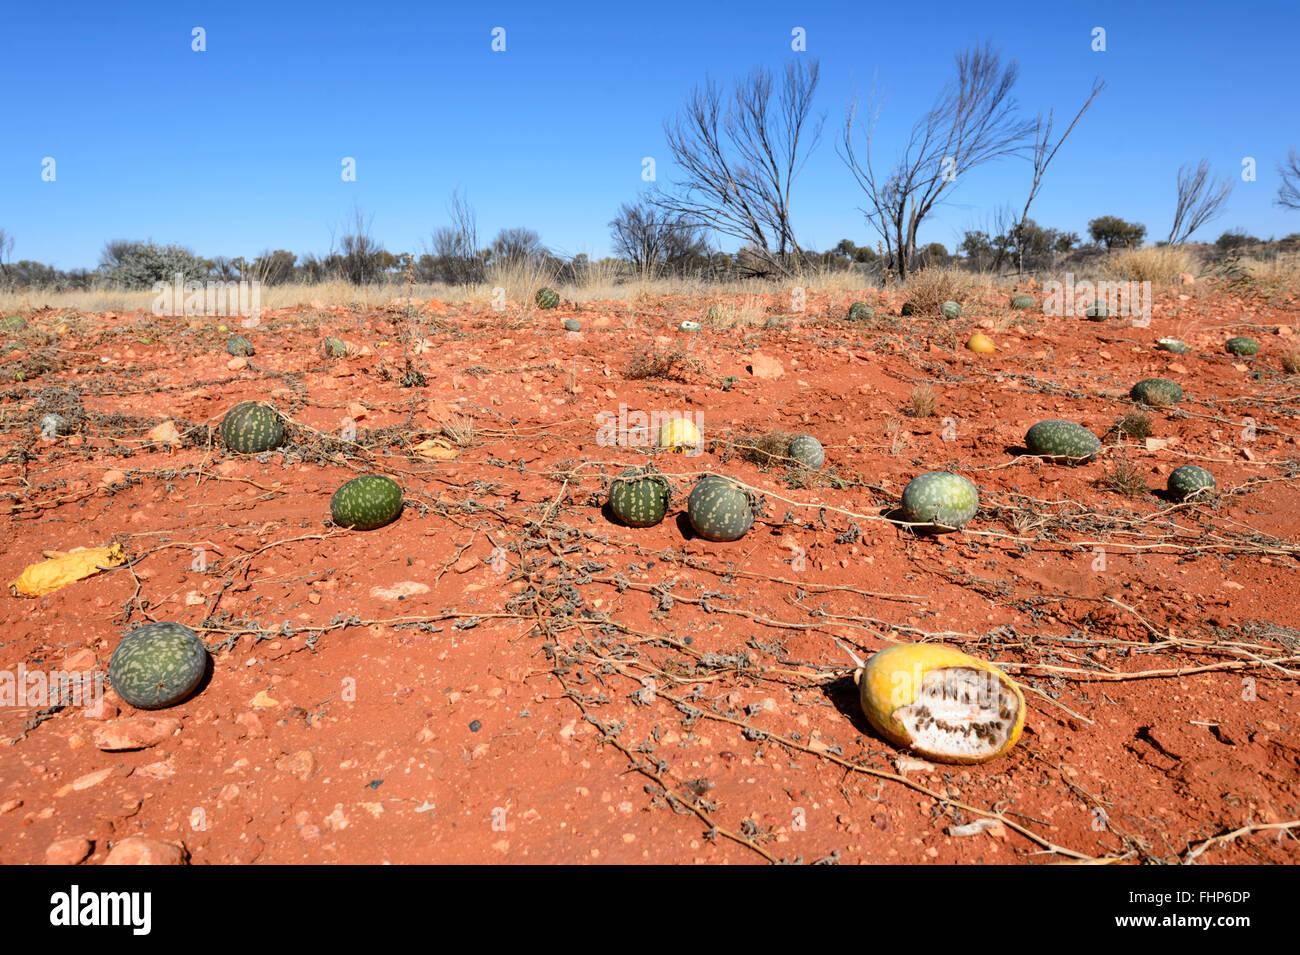 Paddy Melons (Cucumis myriocarpus), Northern Territory, Australia - Stock Image